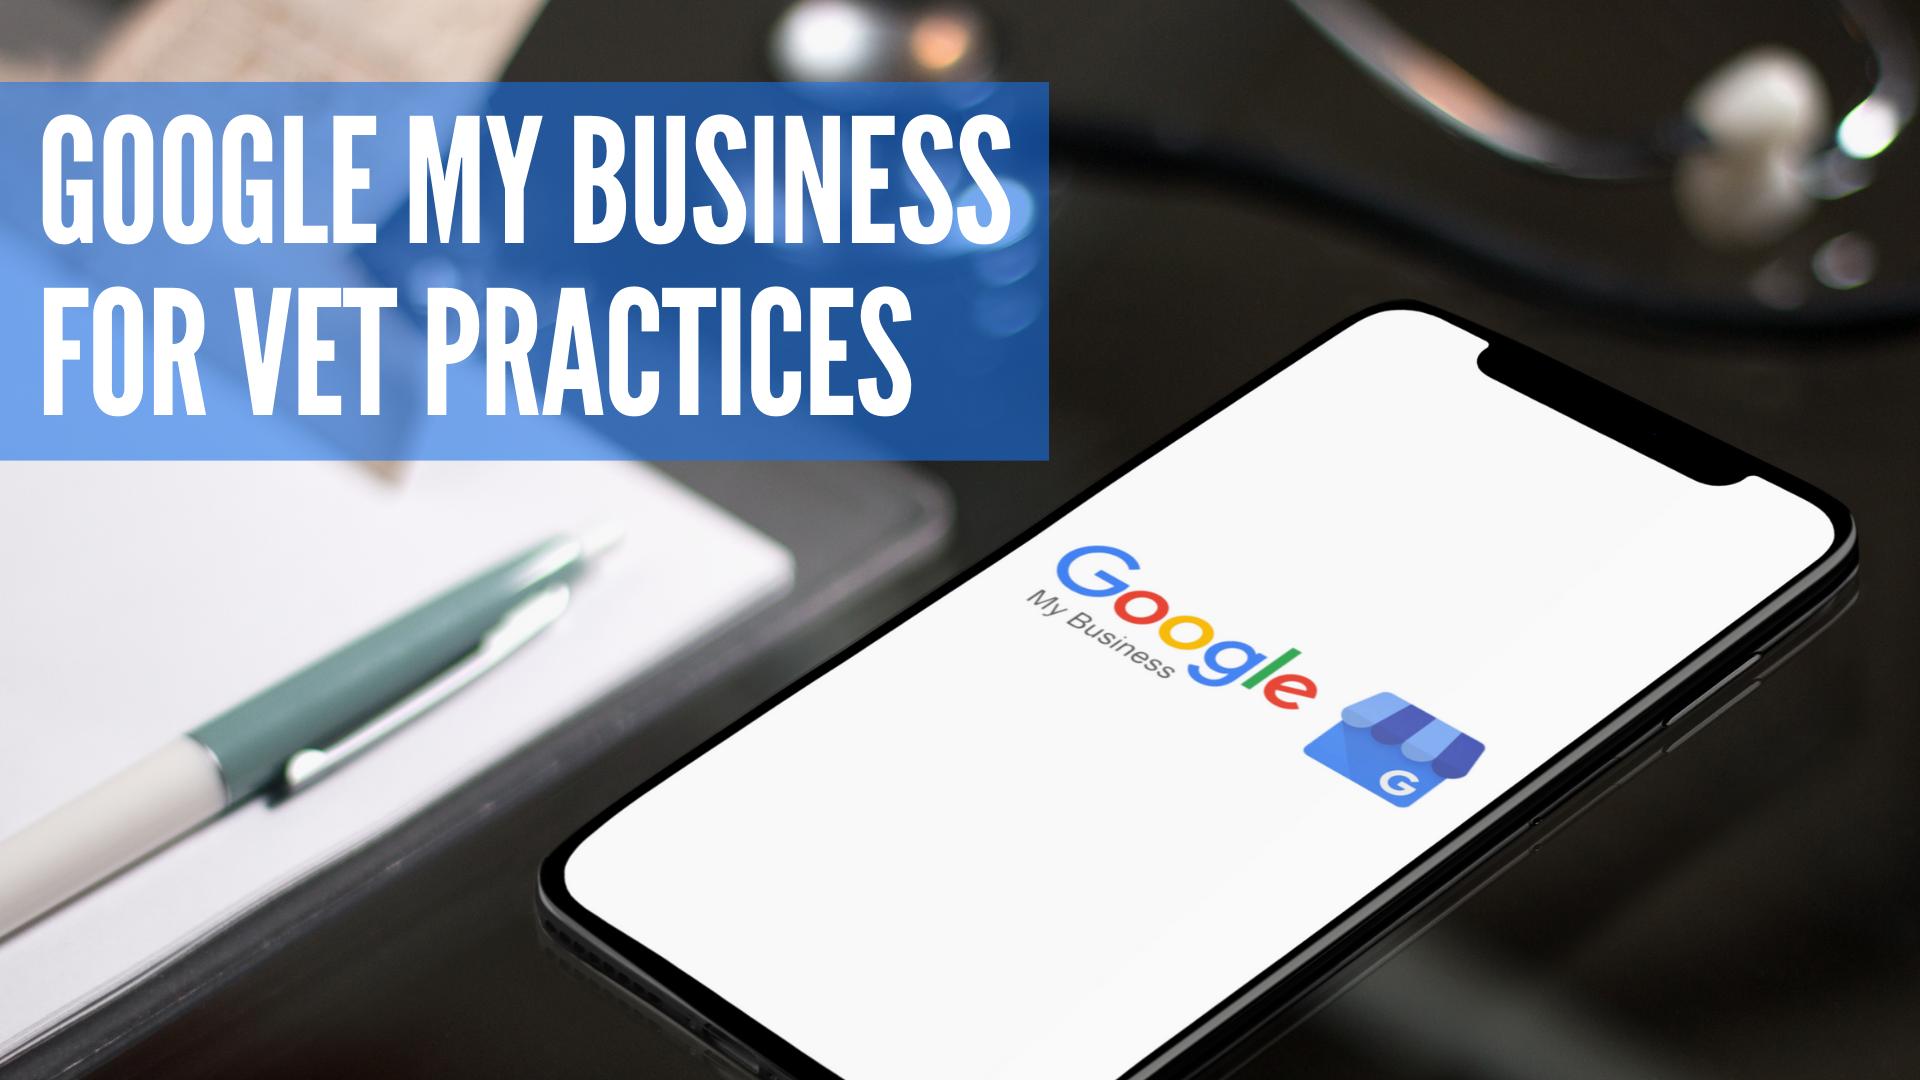 Google Business for Veterinary Clinics